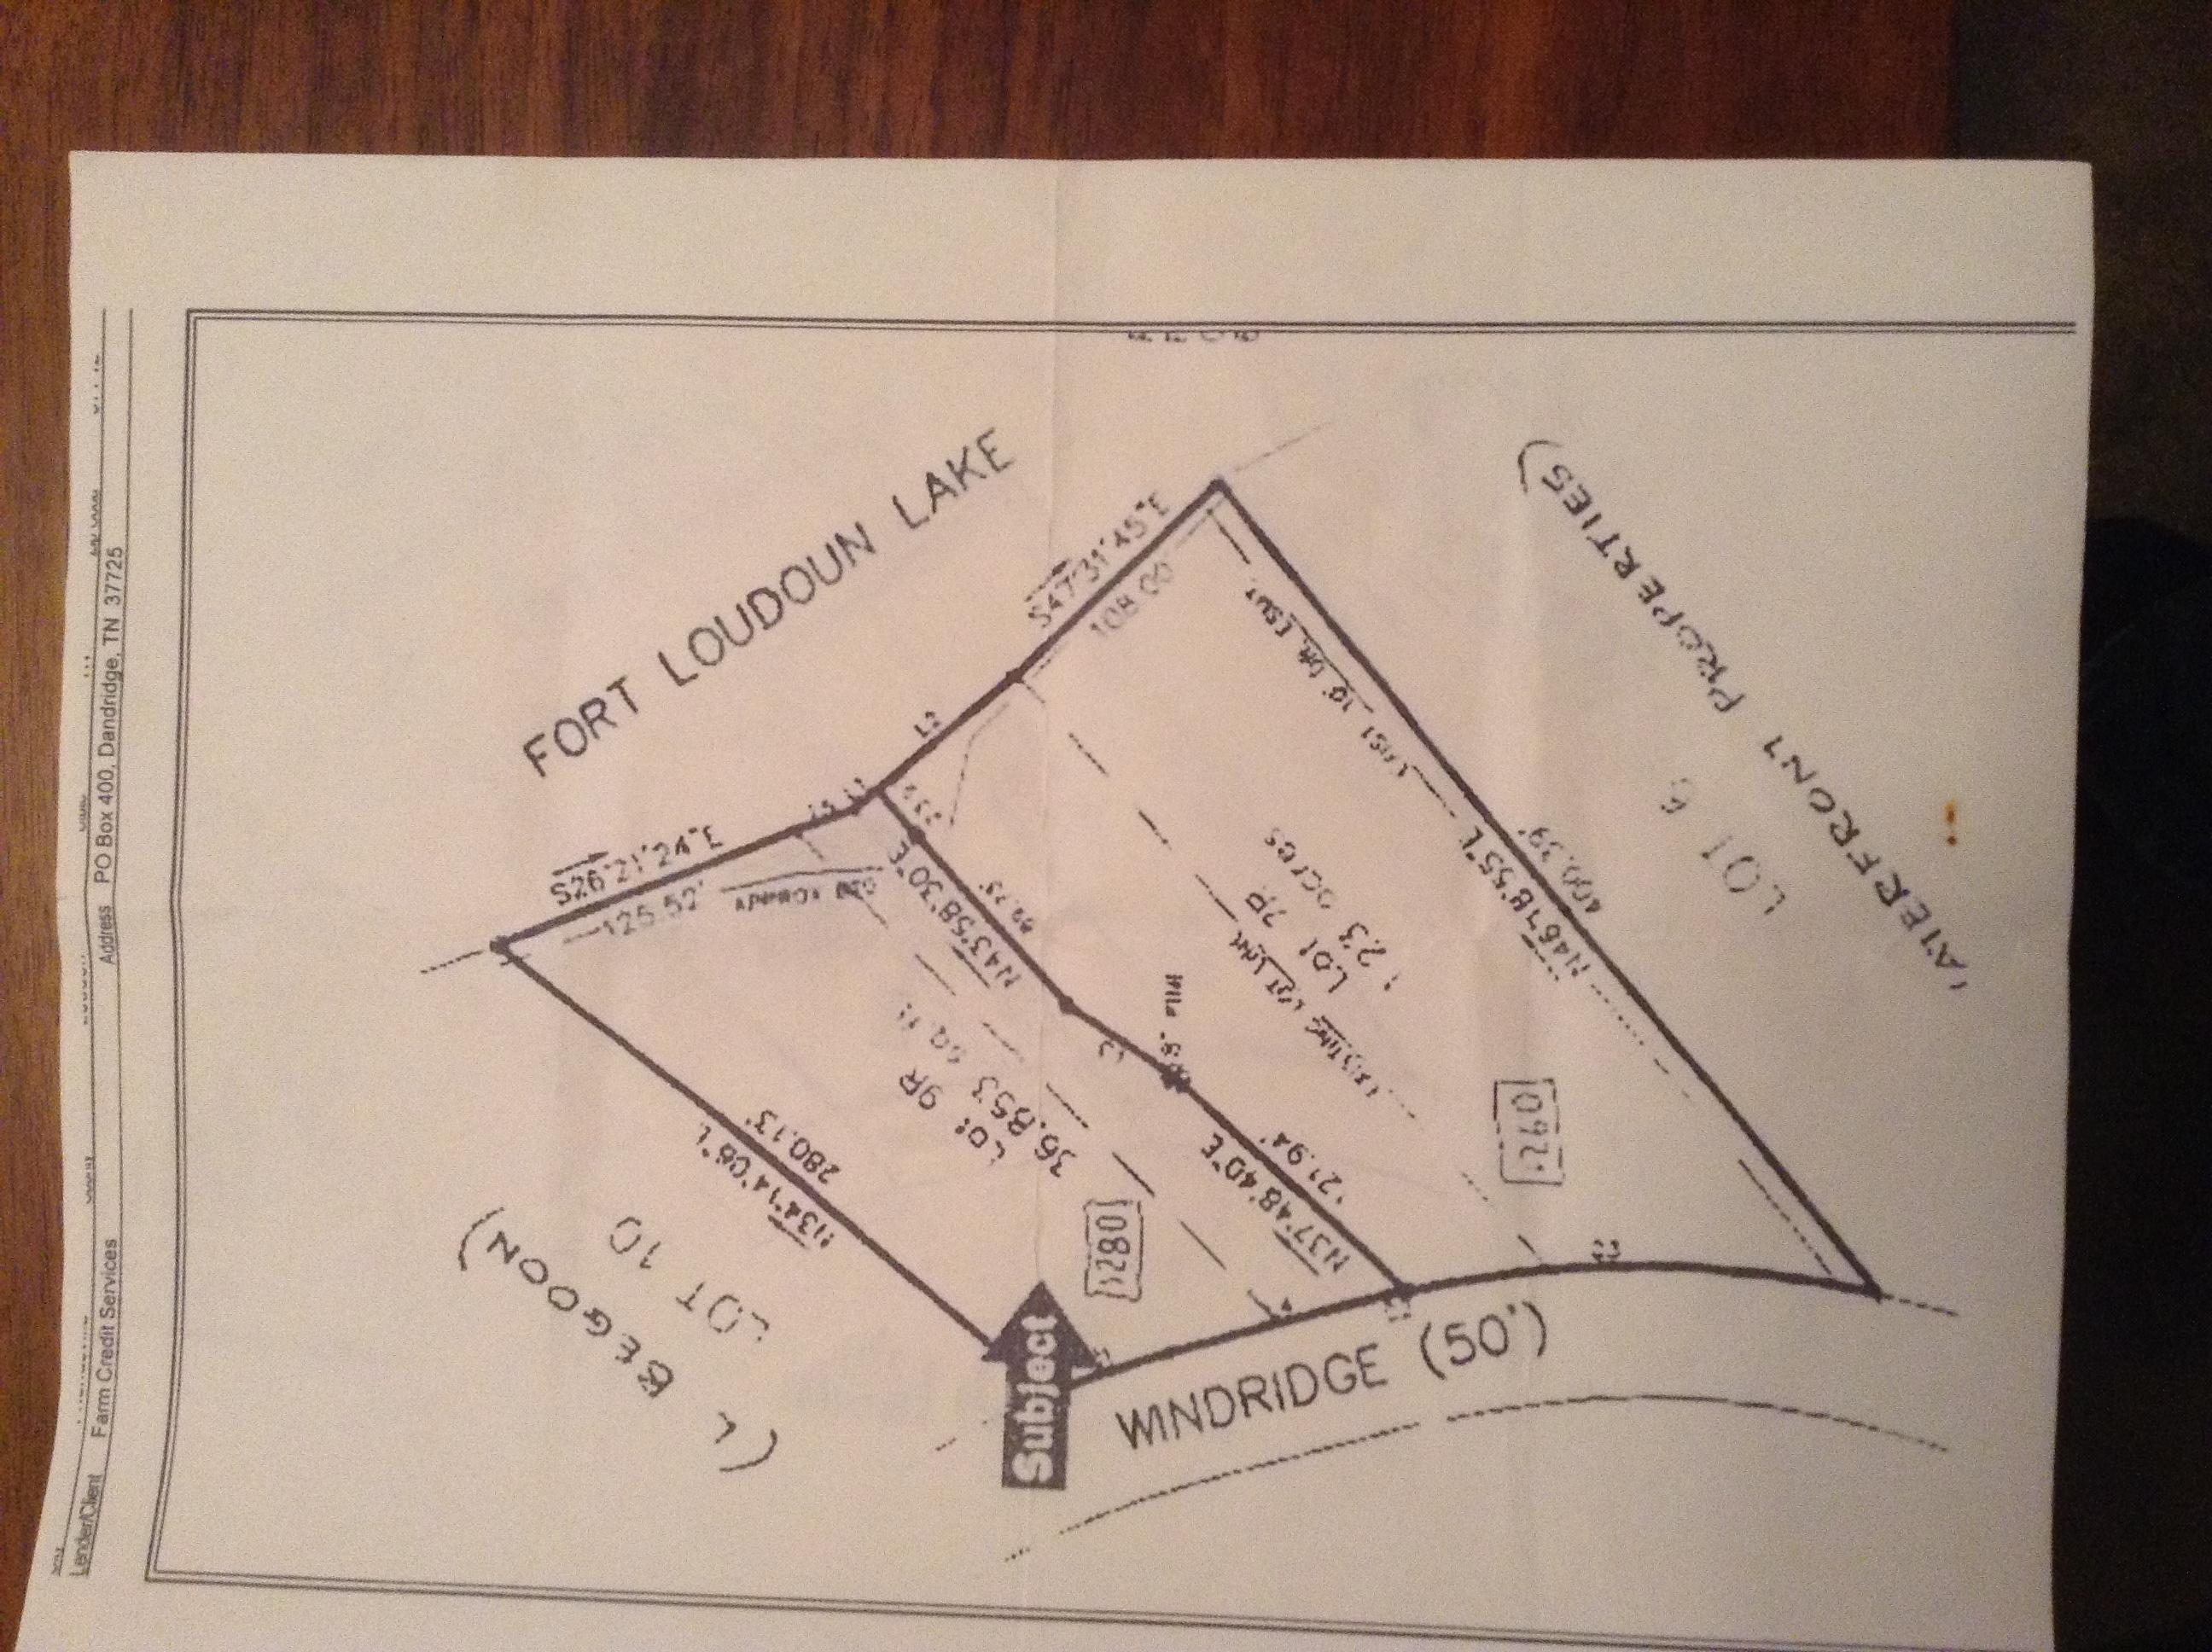 1280 Windridge Rd: